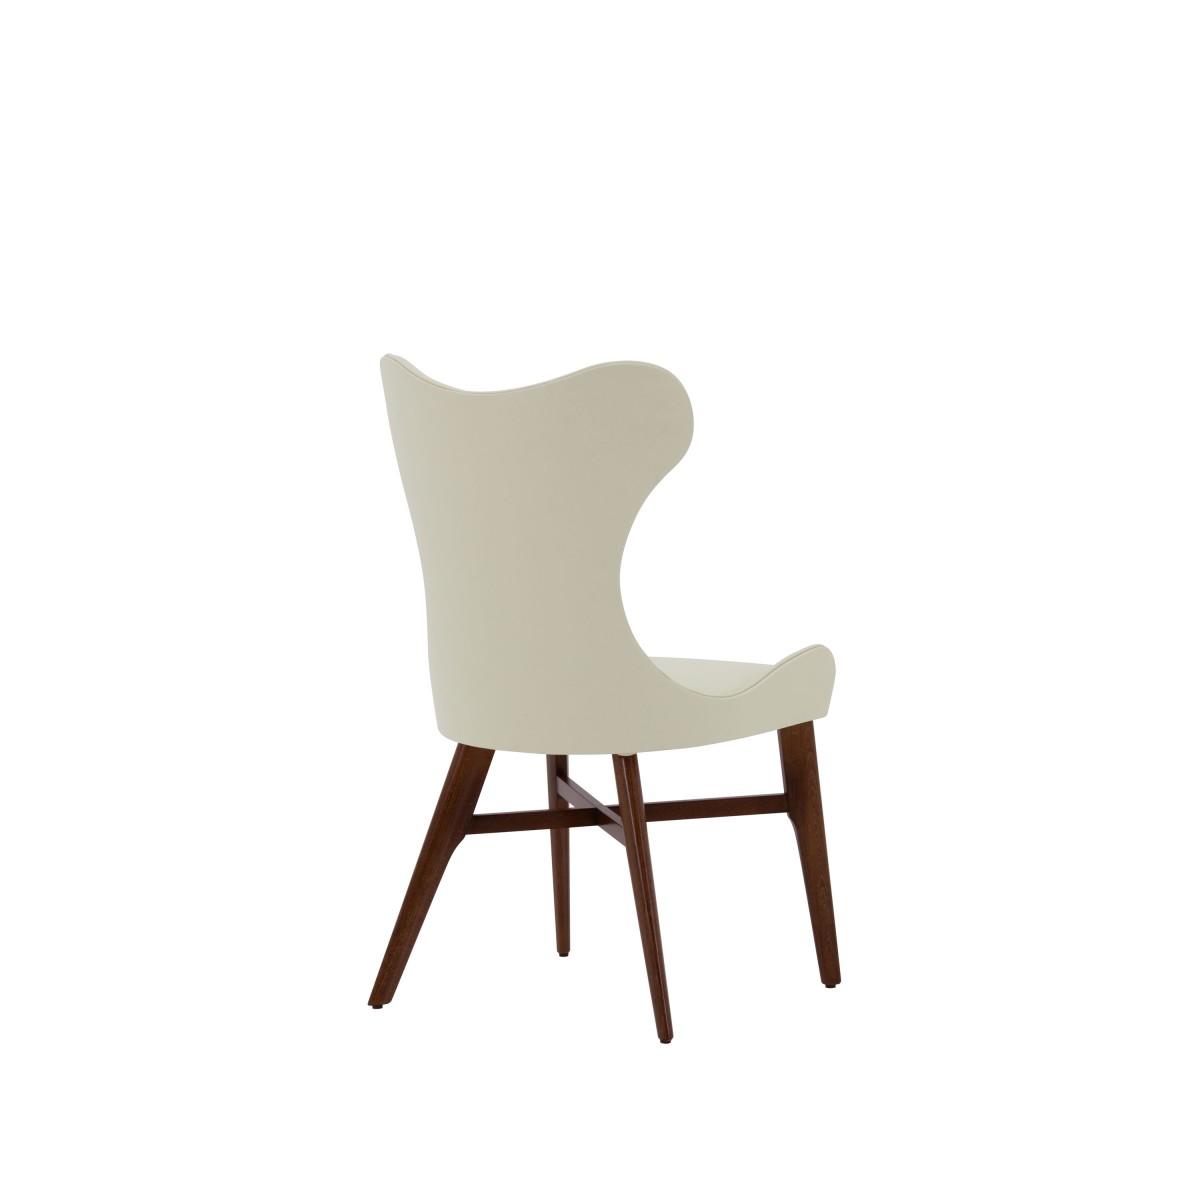 5286 modern style wood chair auribus3